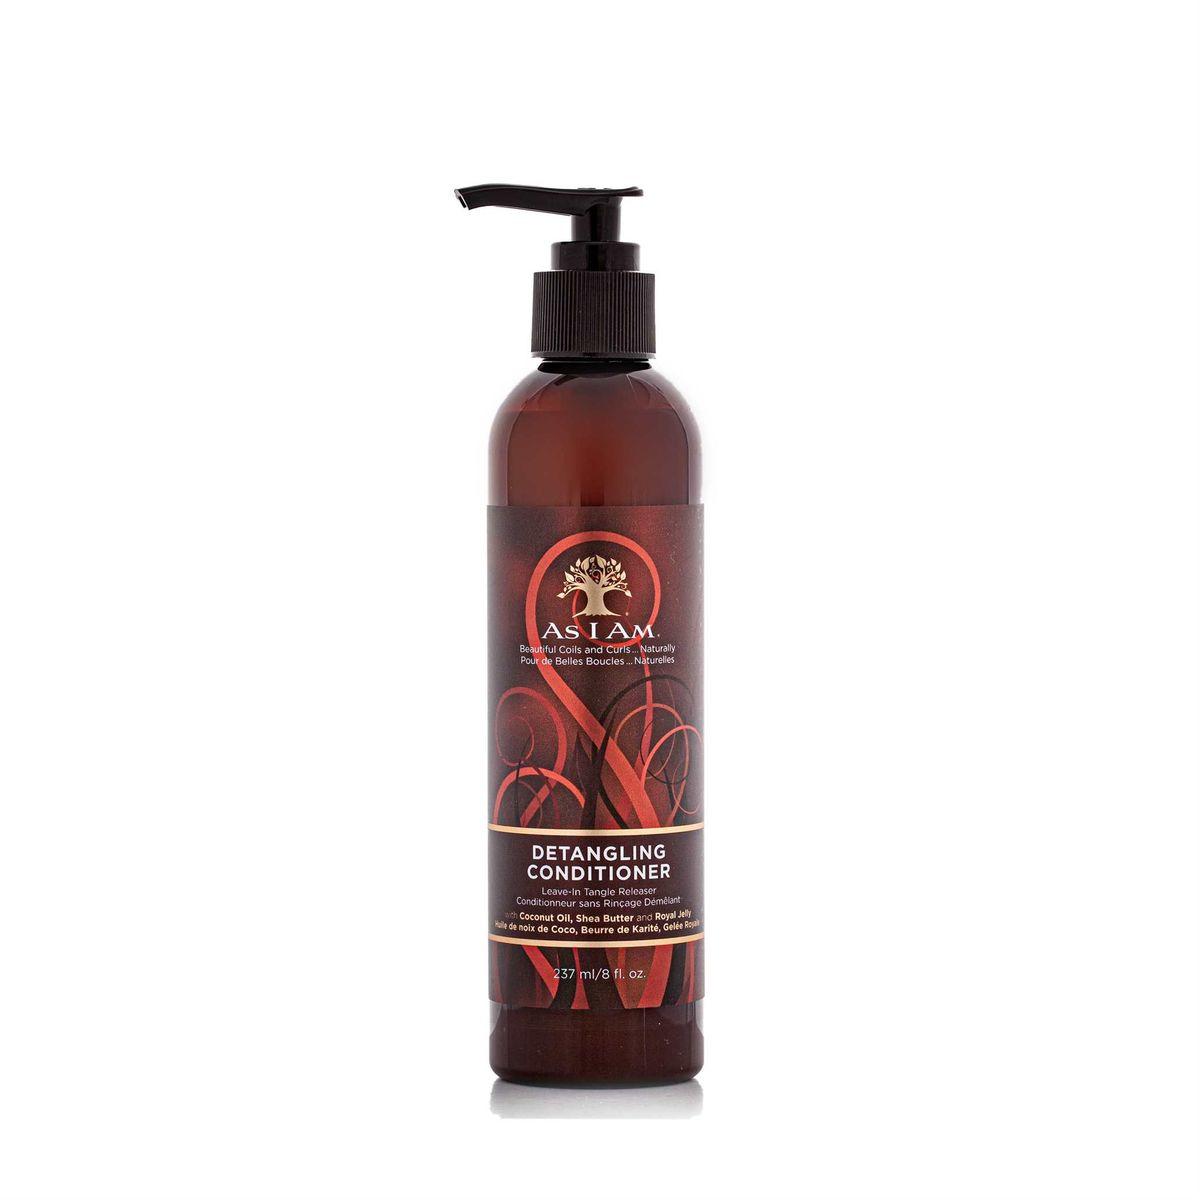 As i am CLASSIC Detangling Conditioner Leave In Tangle Releaser 20oz 20ml    Haarspülung Haarentwirrer   UREMBO   Der online Afro Beauty Shop für ...